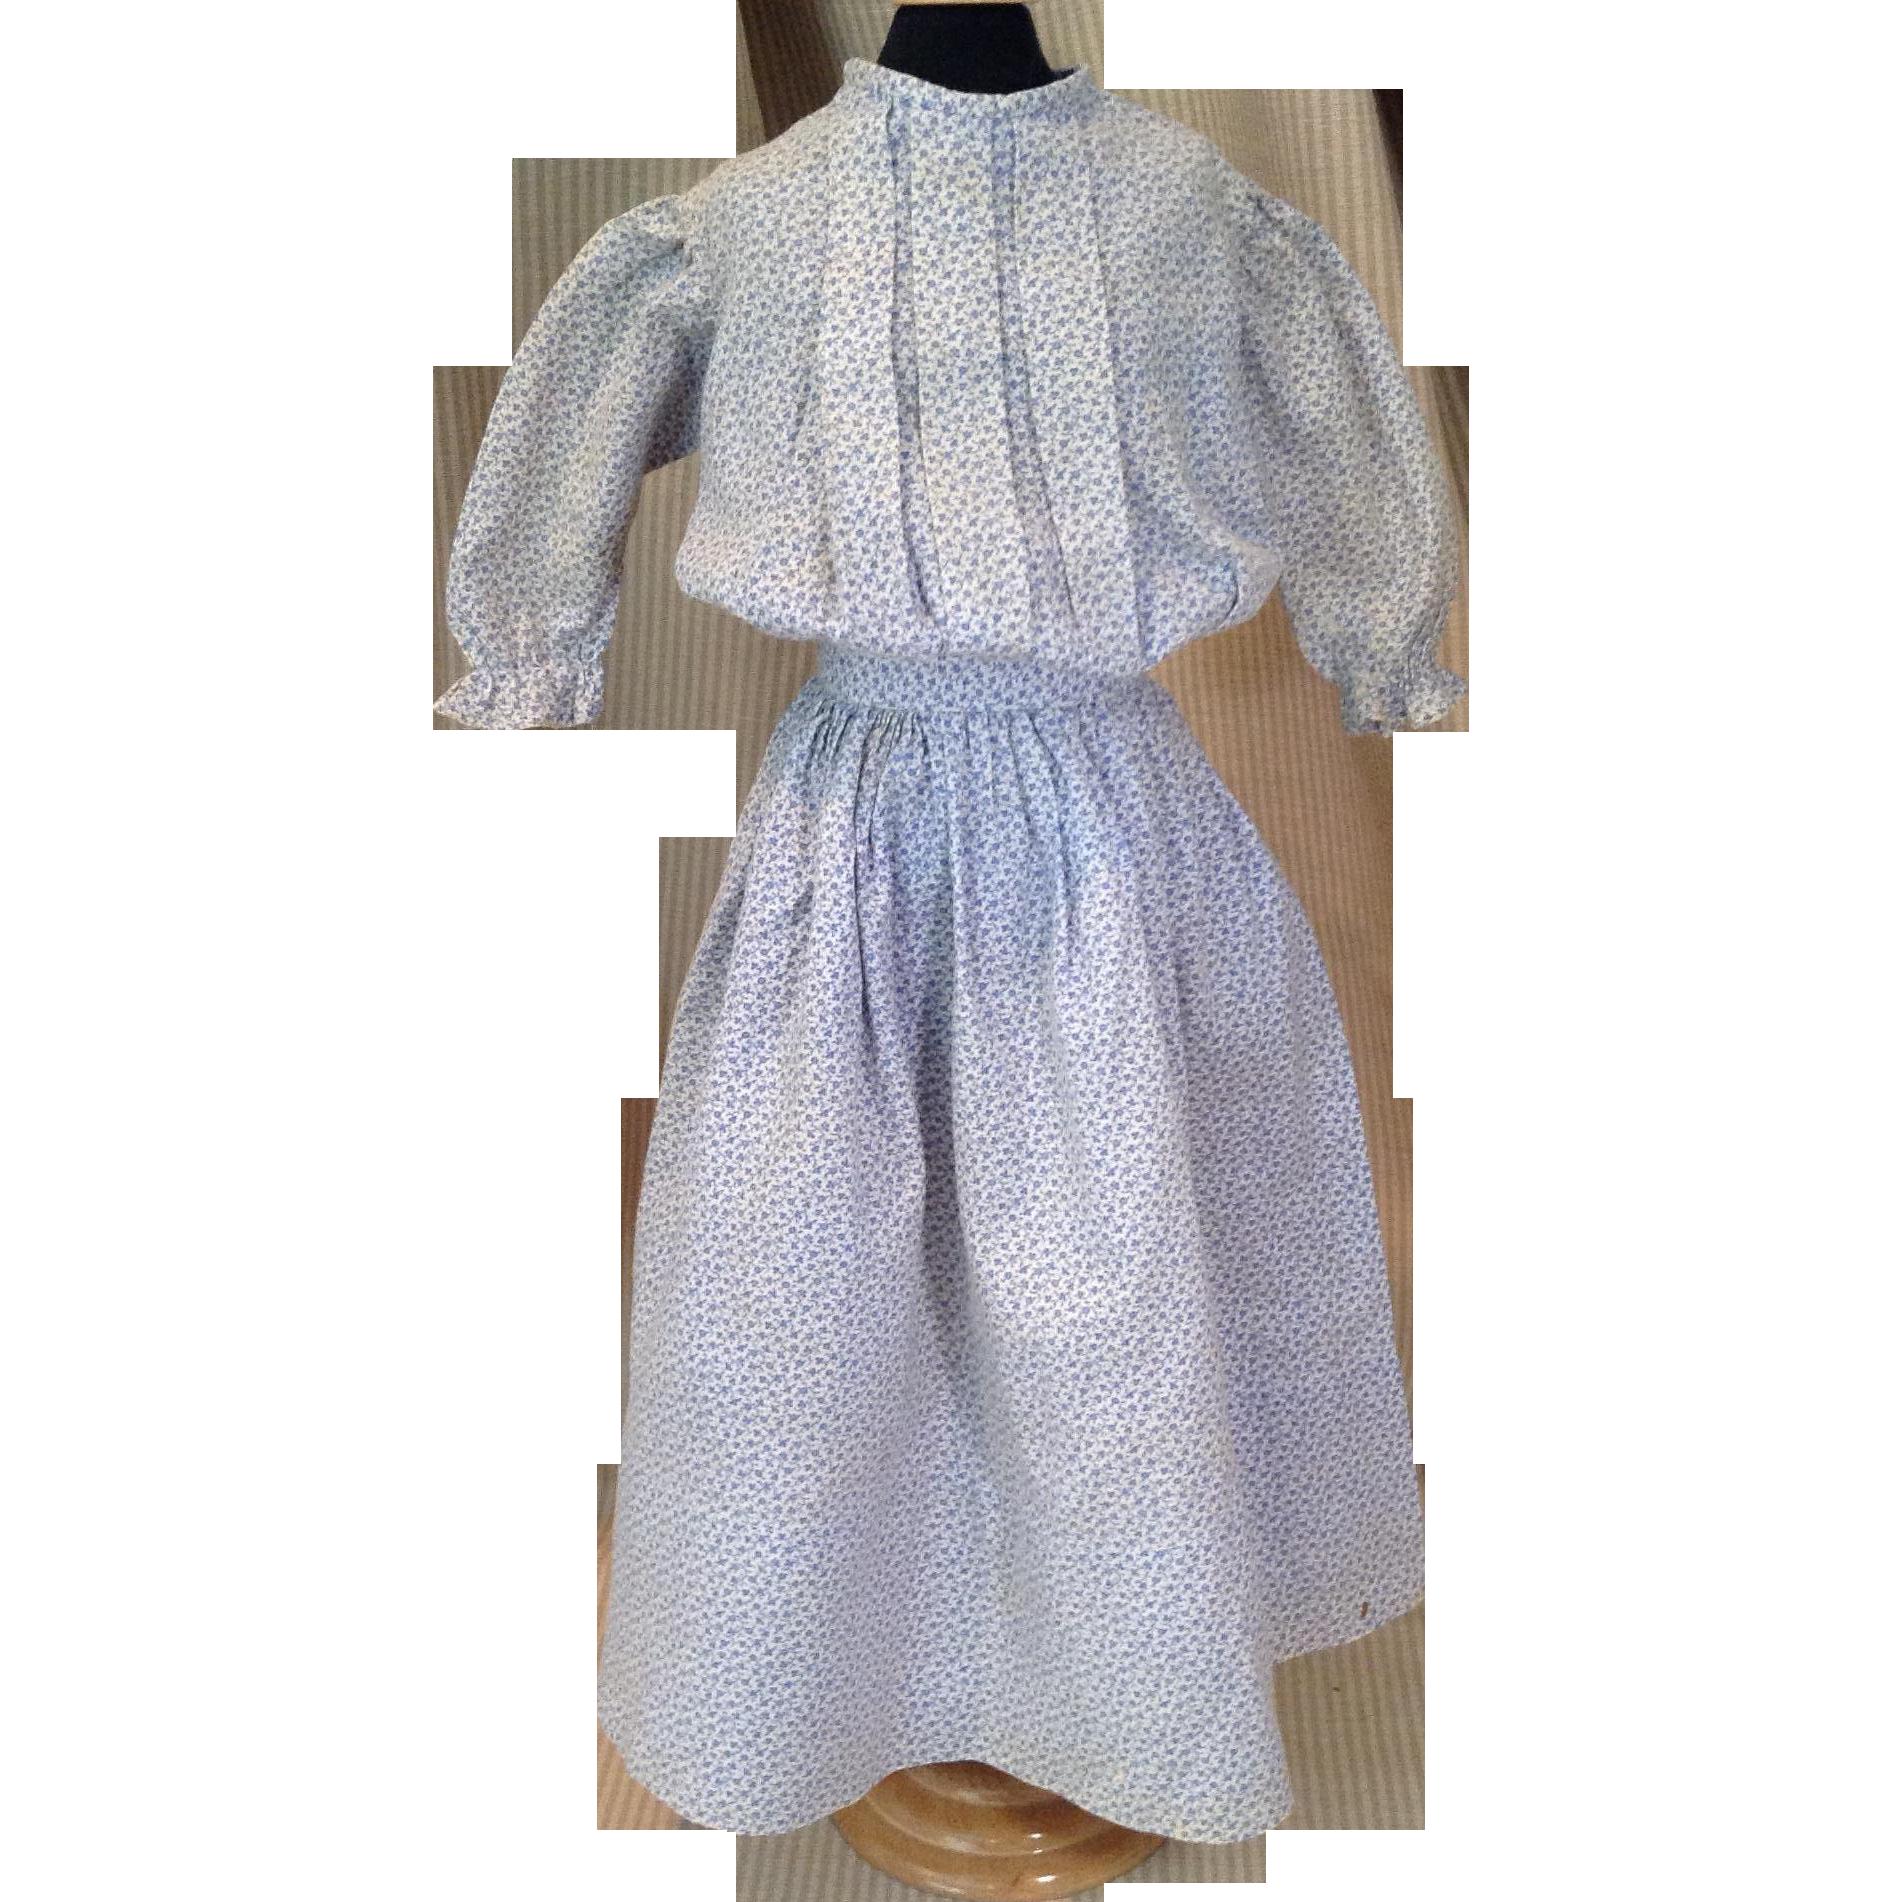 C.1900 Two Piece Calico Doll Dress